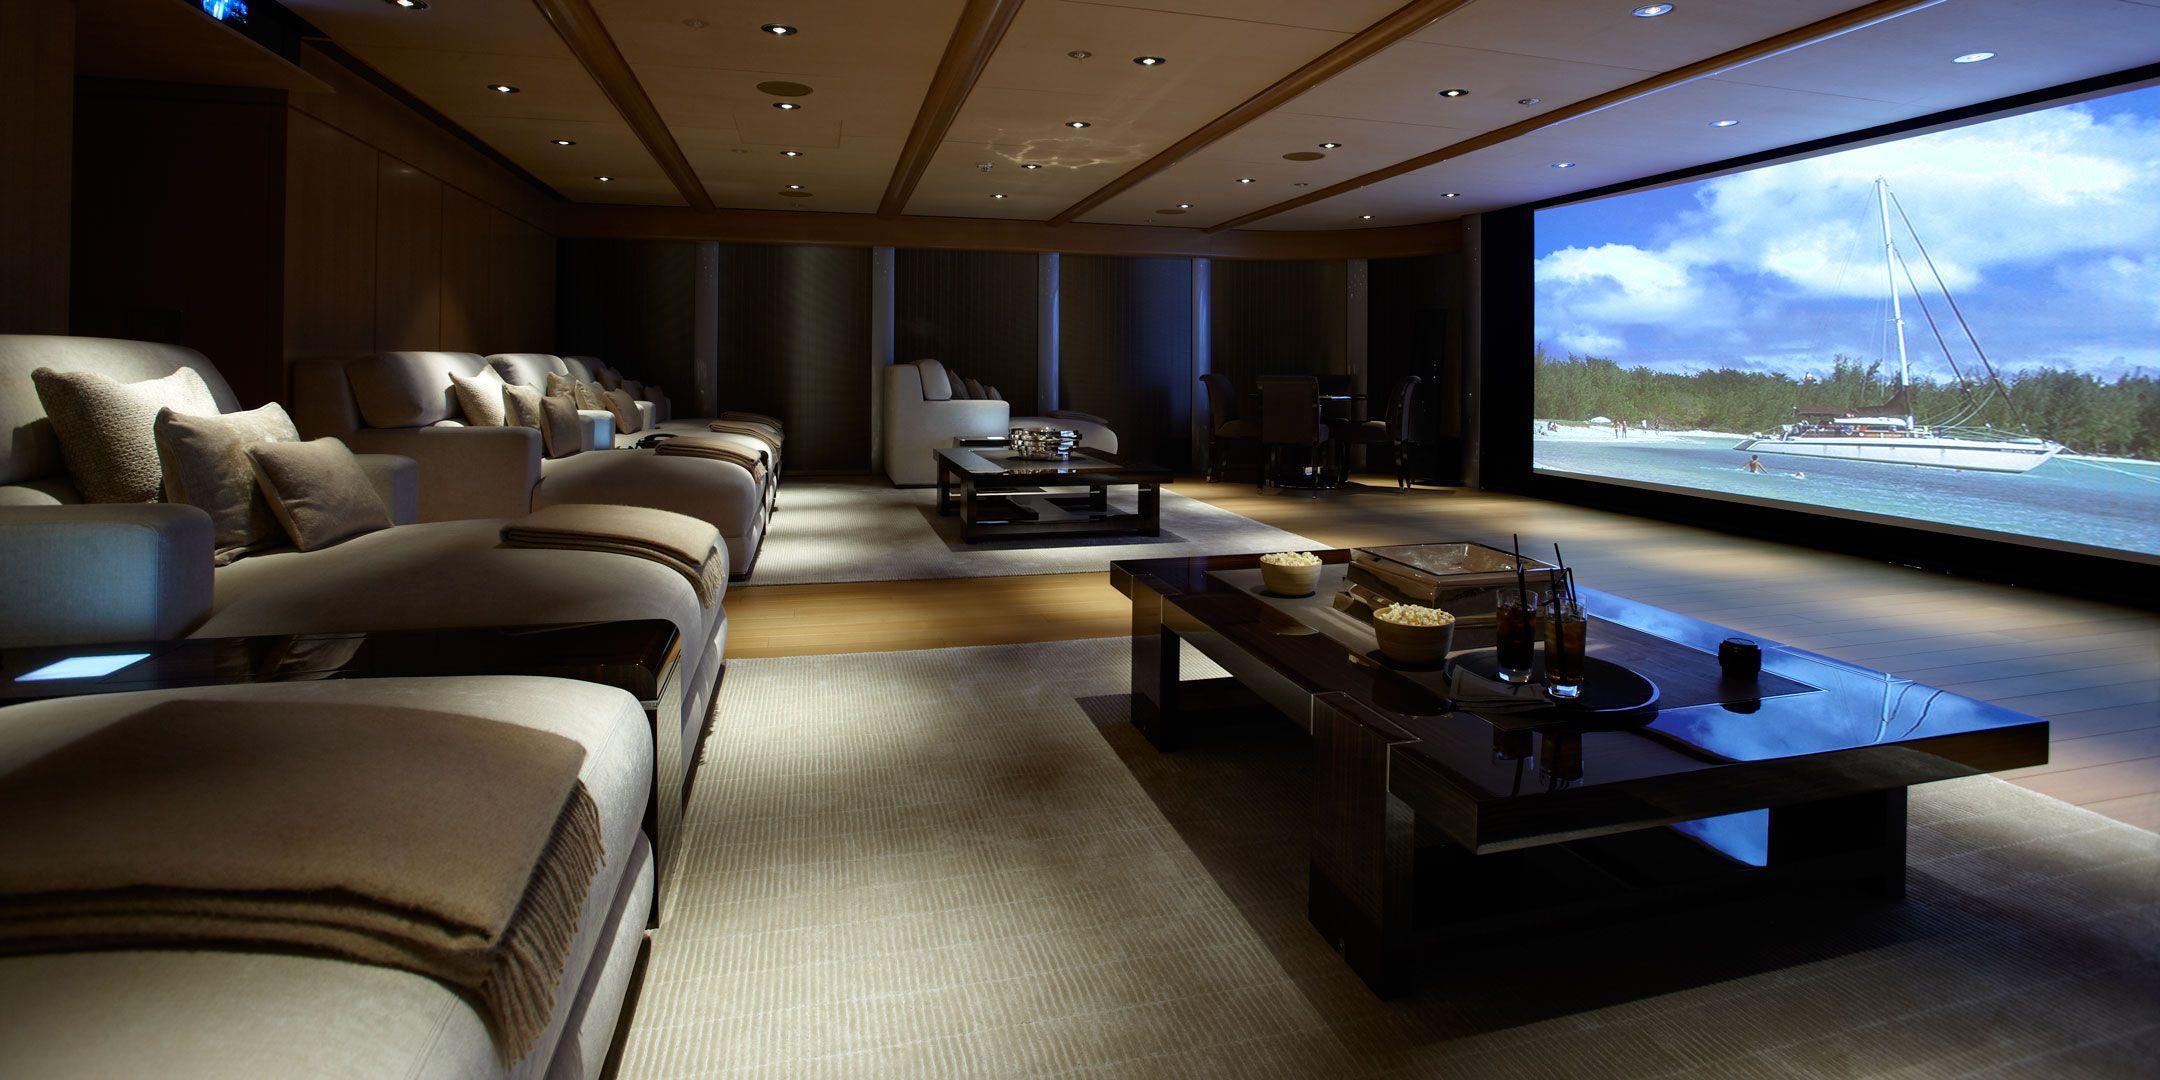 musashi cinema room jpg 2160a 1080 eclipse pinterest cinema